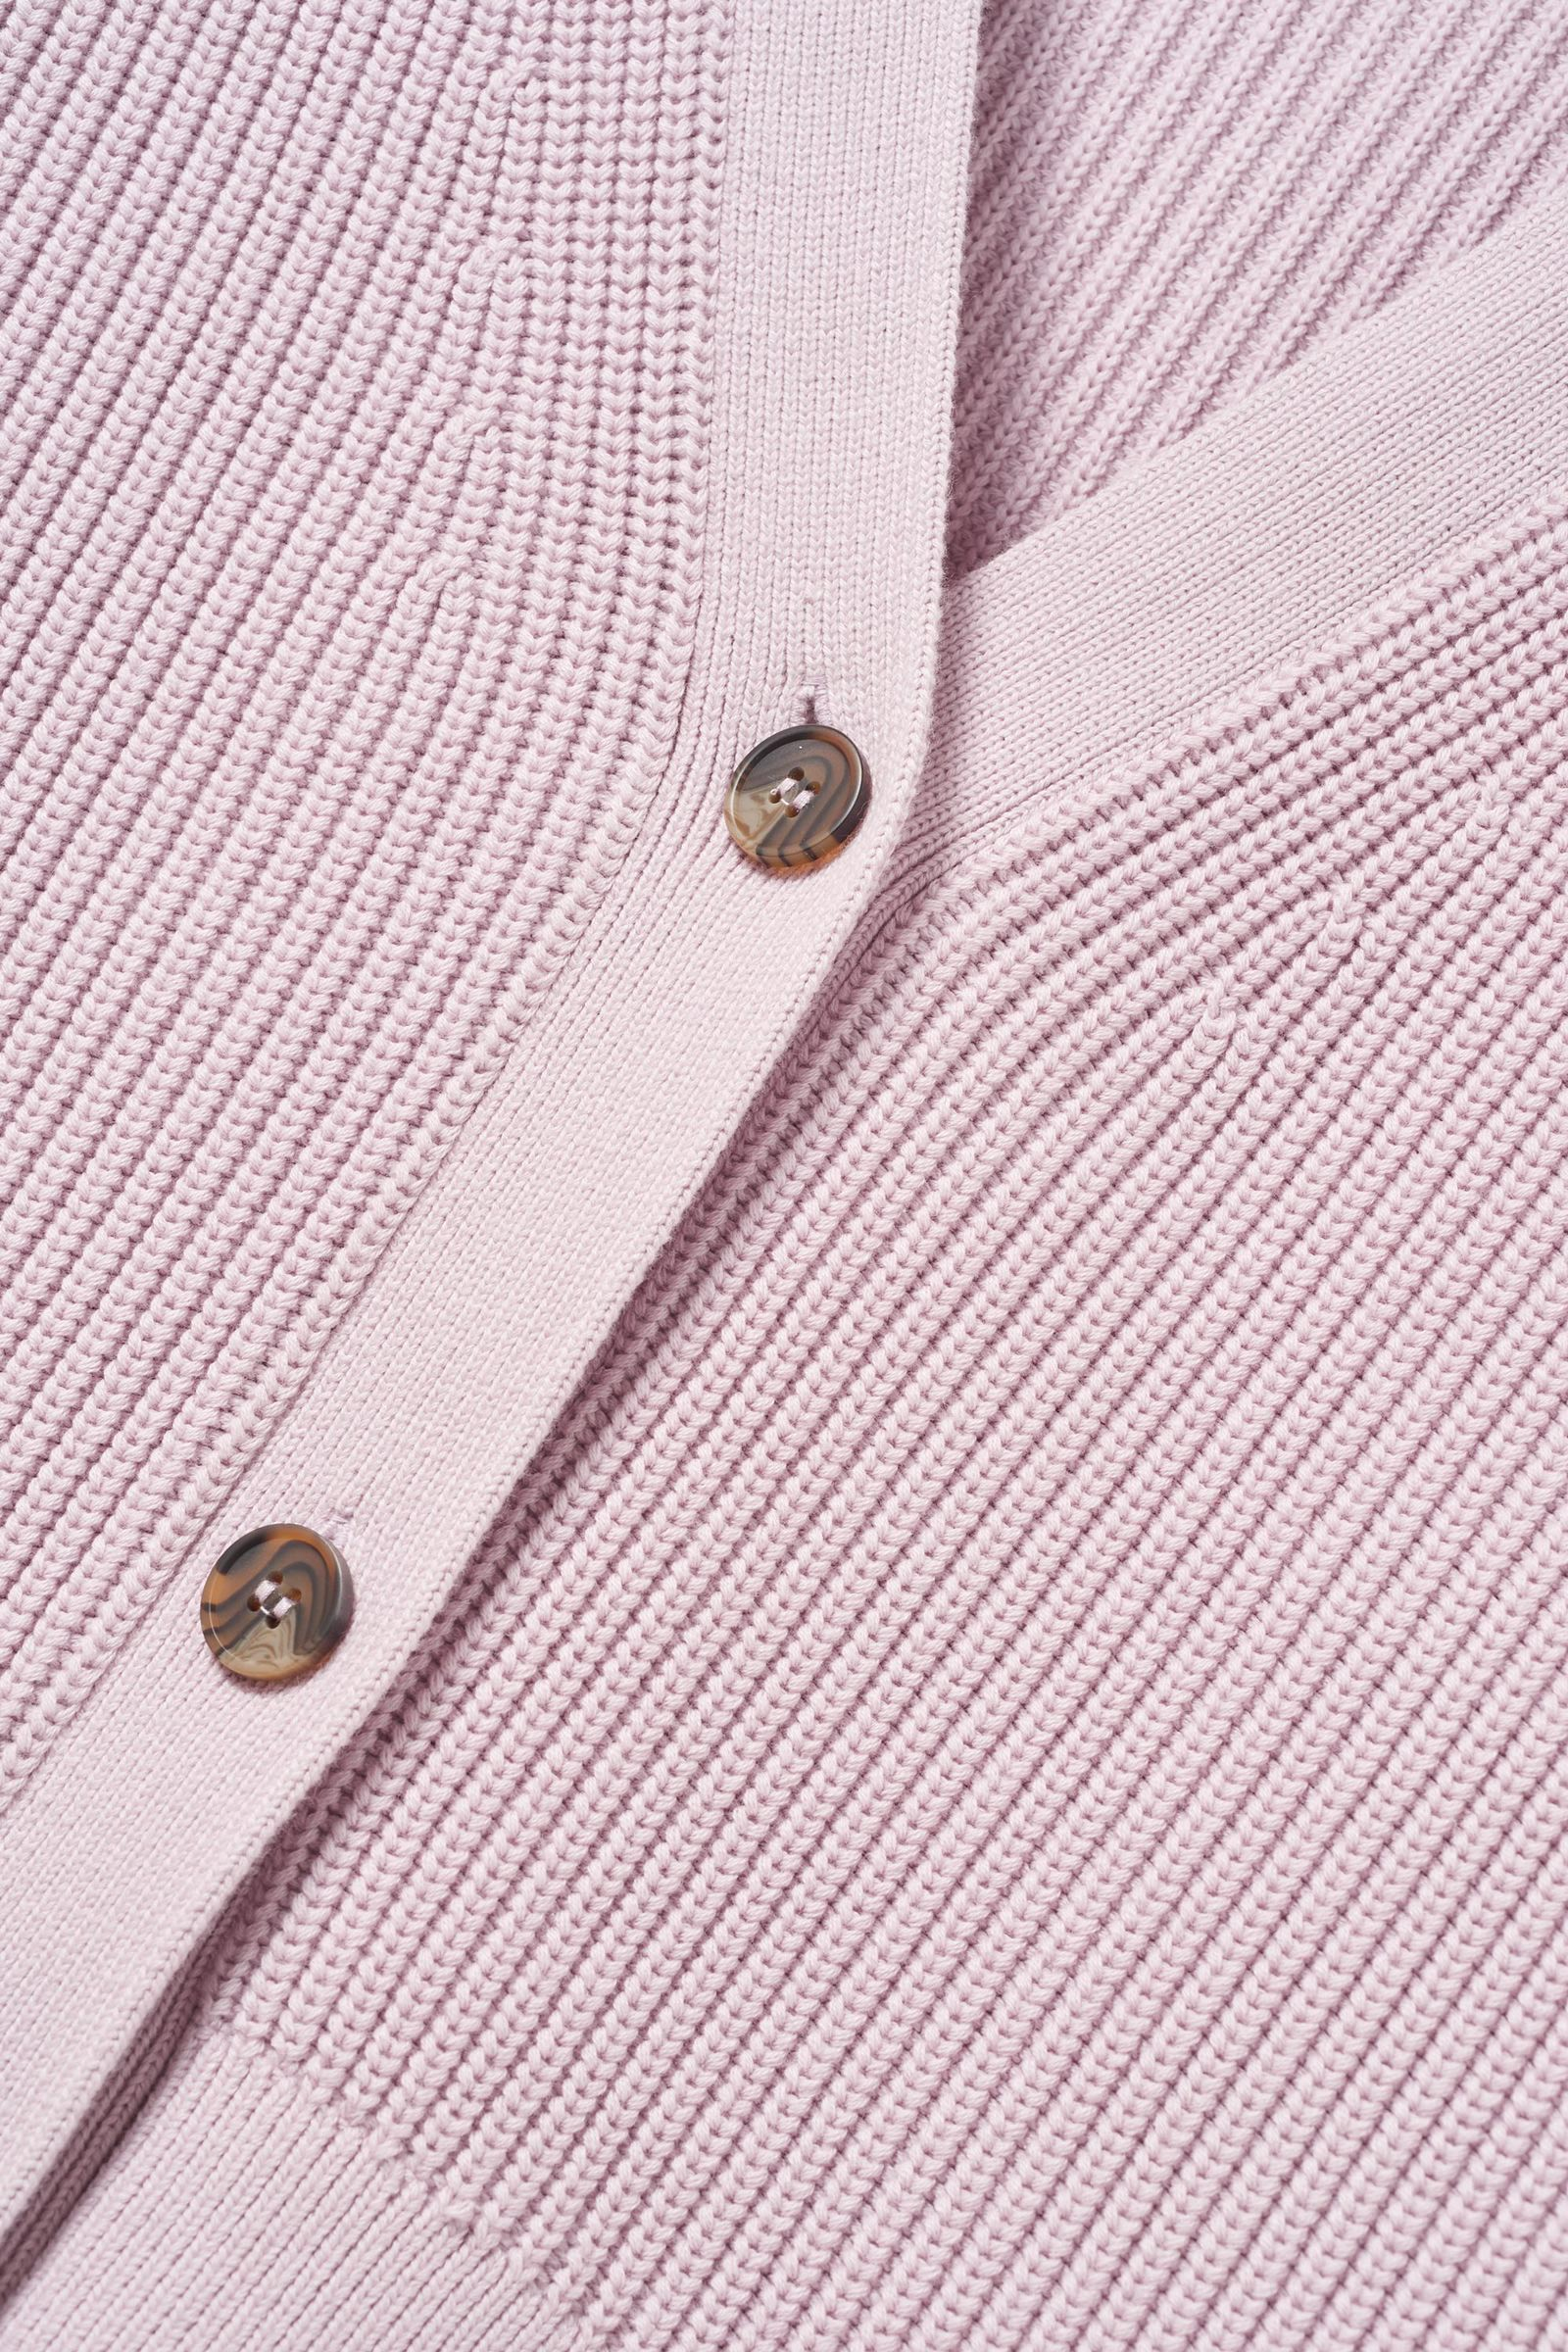 COS 자카드 니트 가디건의 핑크컬러 Detail입니다.